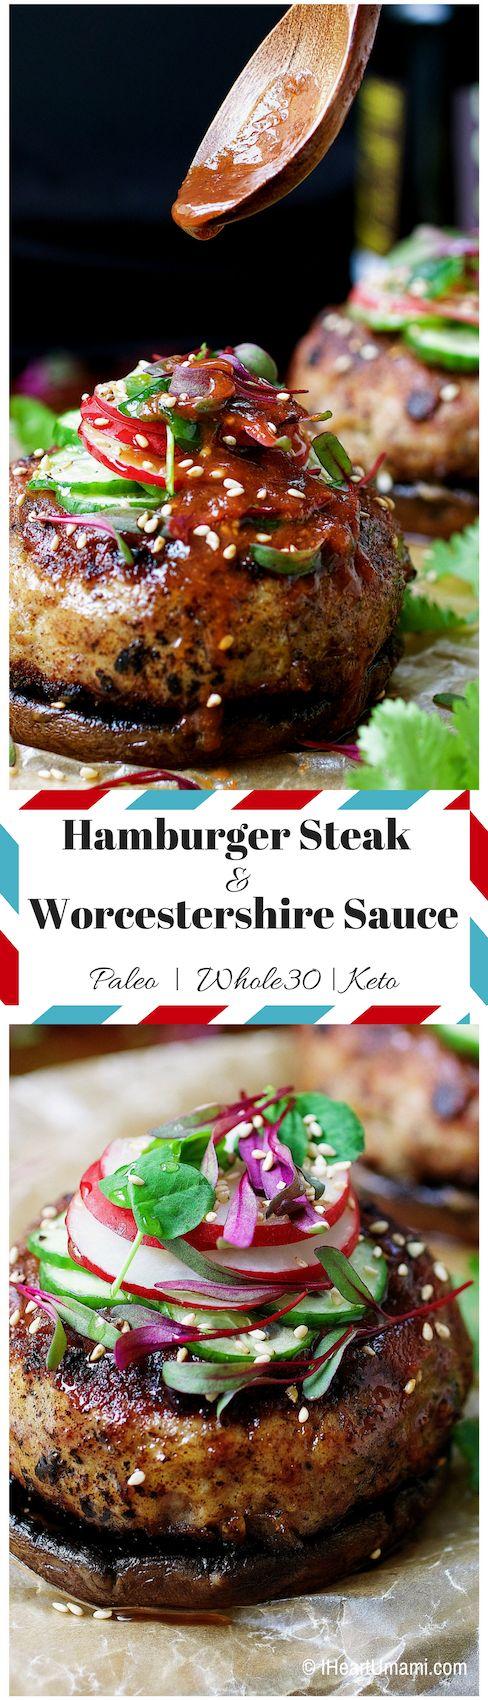 Paleo Worcestershire Sauce Hamburger Steak | IHeartUmami.com